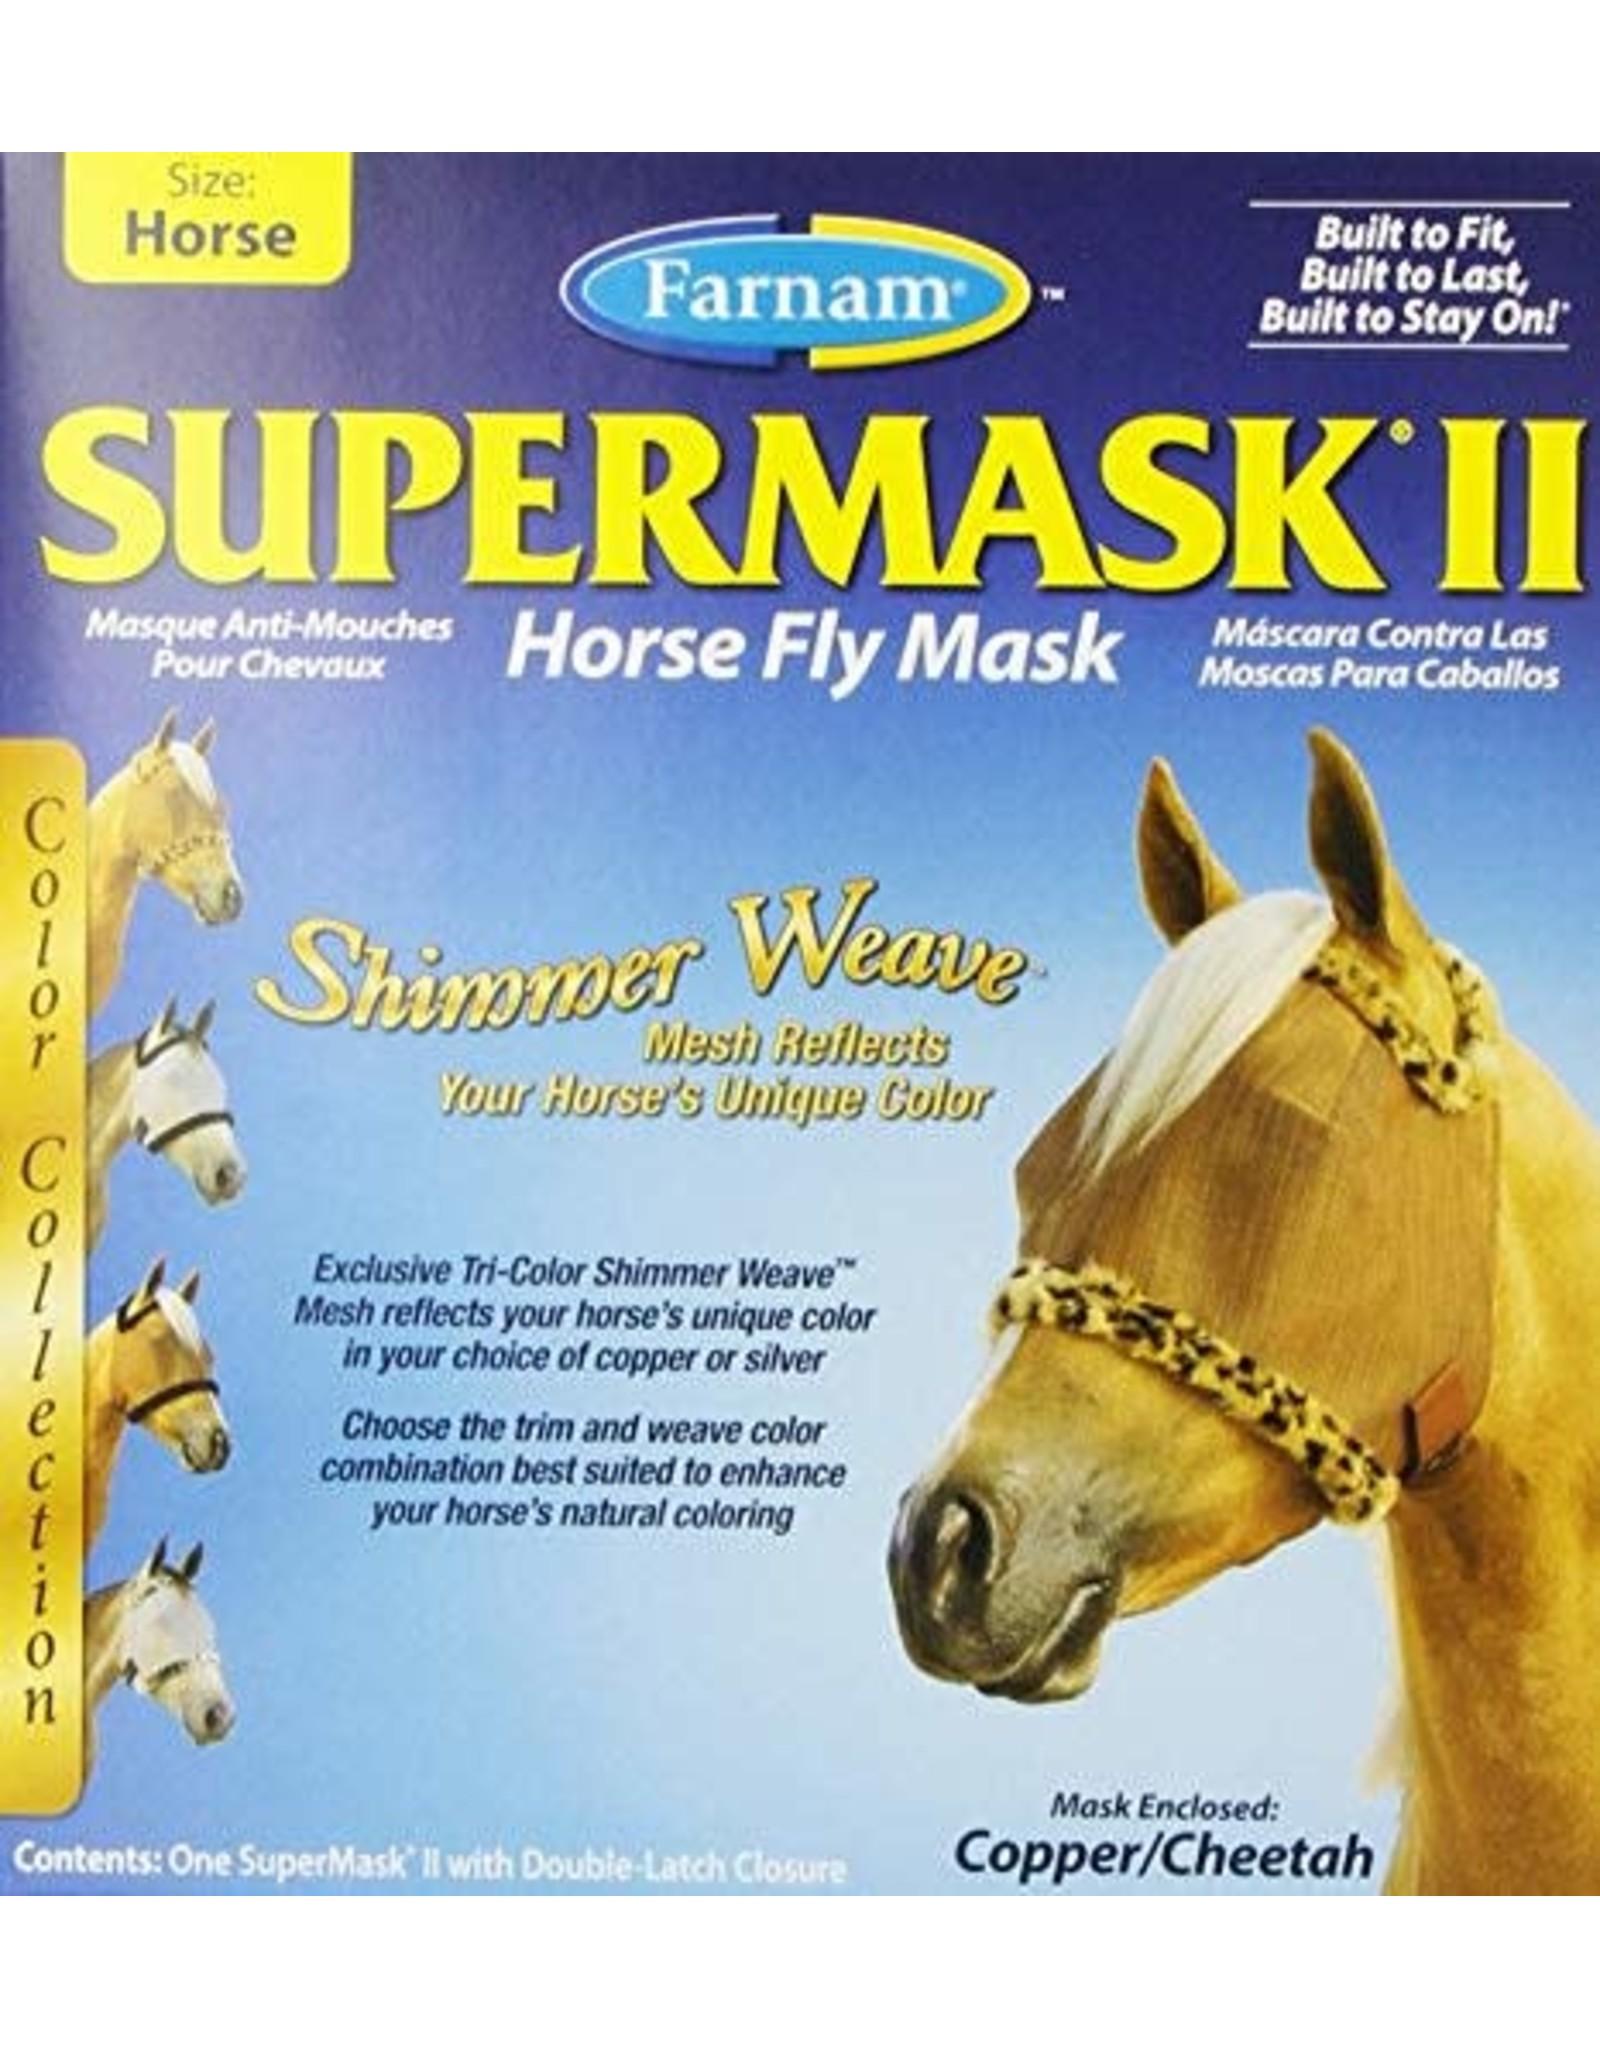 Farnam Supermask II Shimmer Weave without Ears